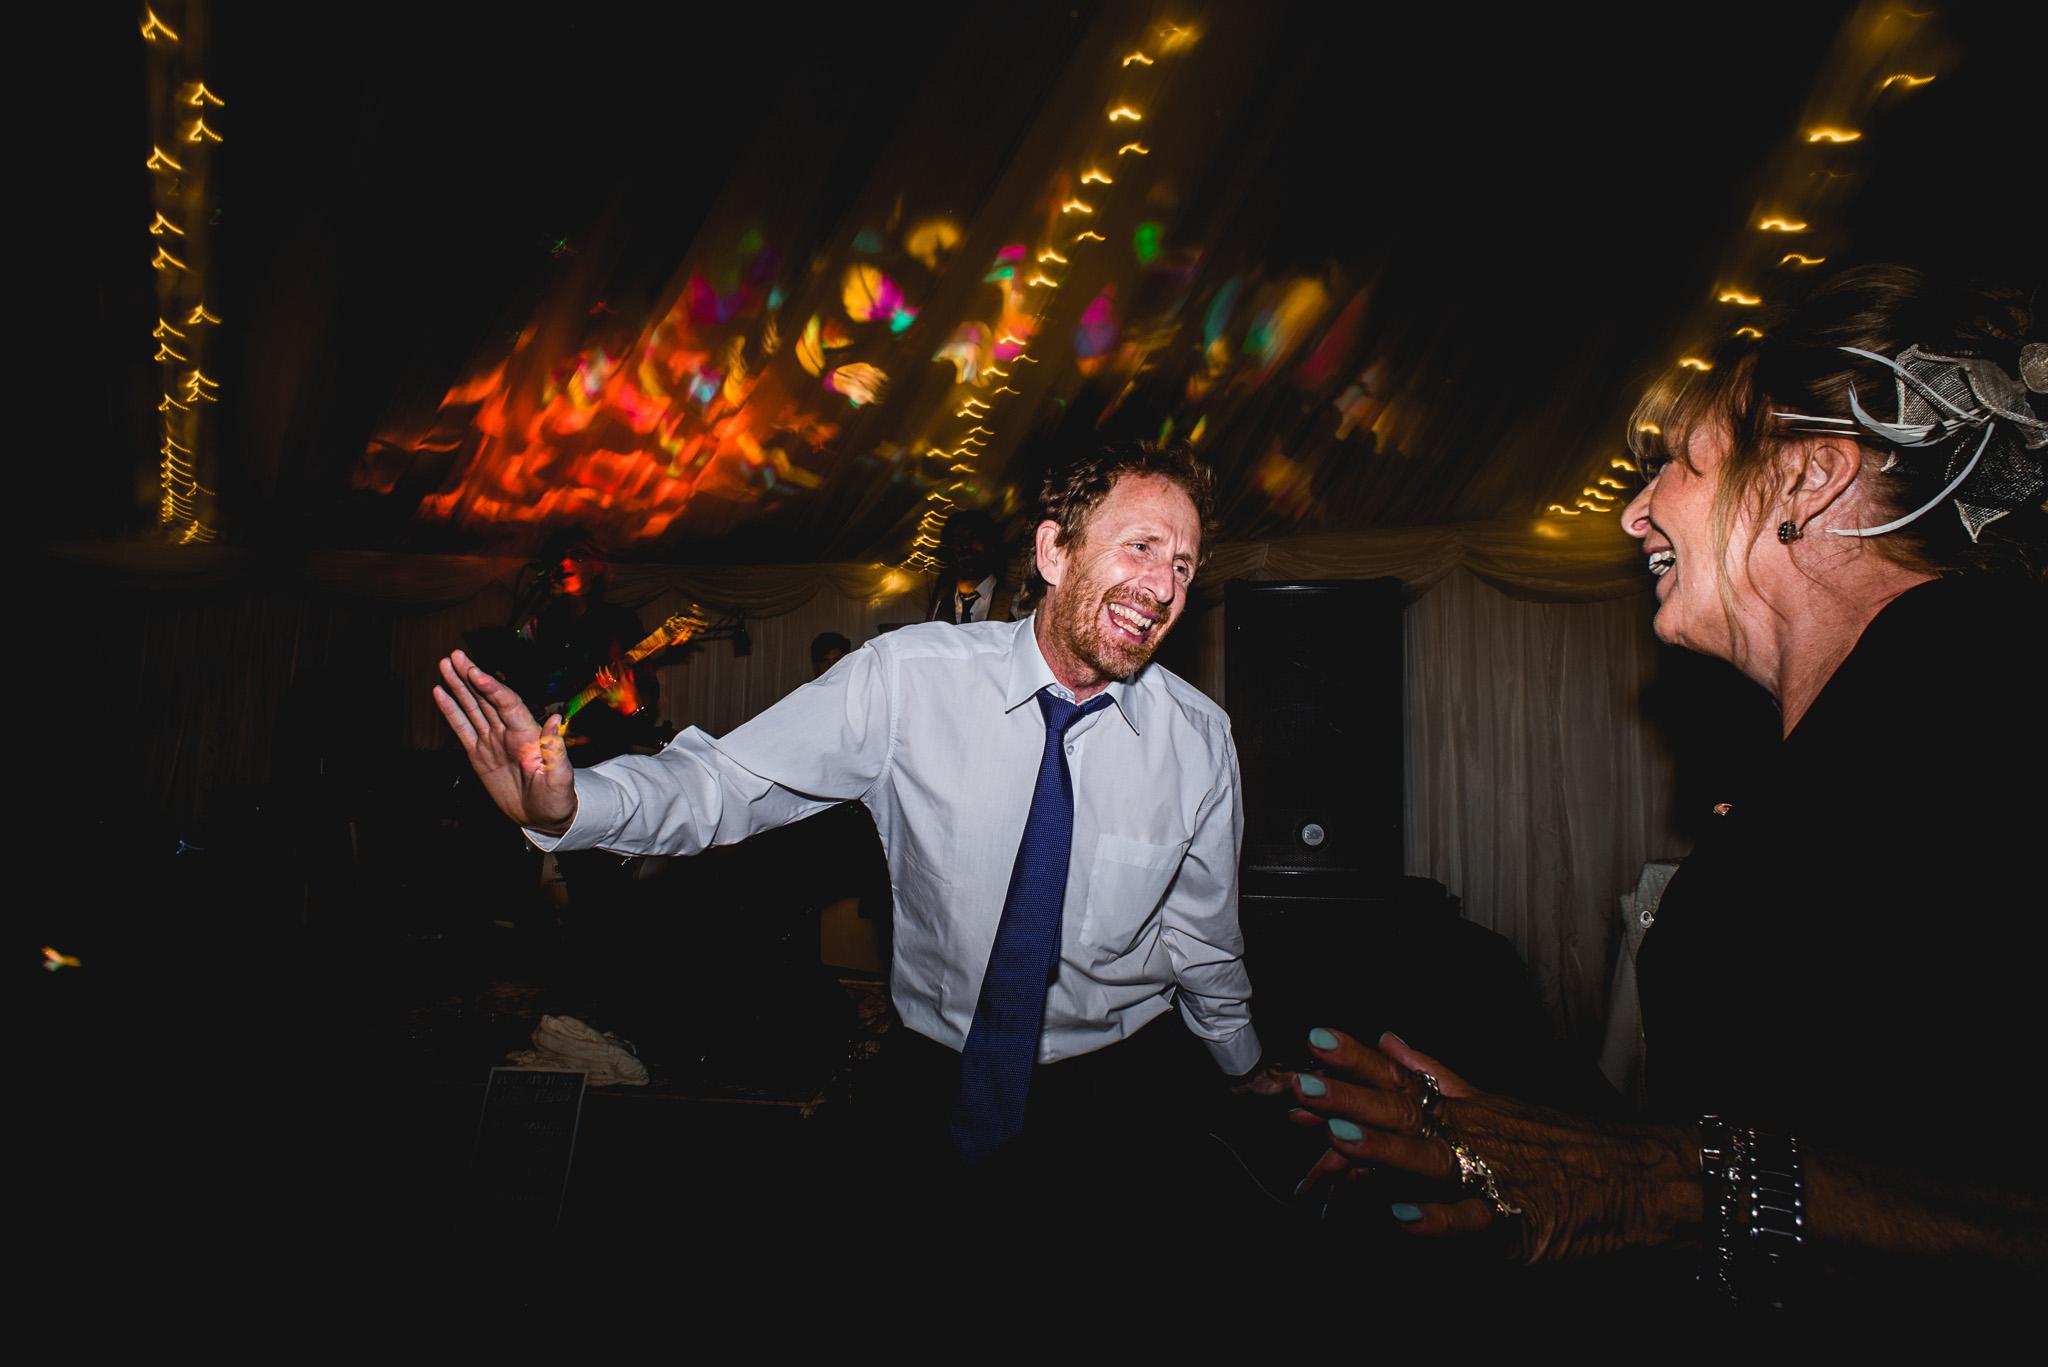 Lara & Jack Wedding 220815 by Barney Walters_1077_BW2_1190